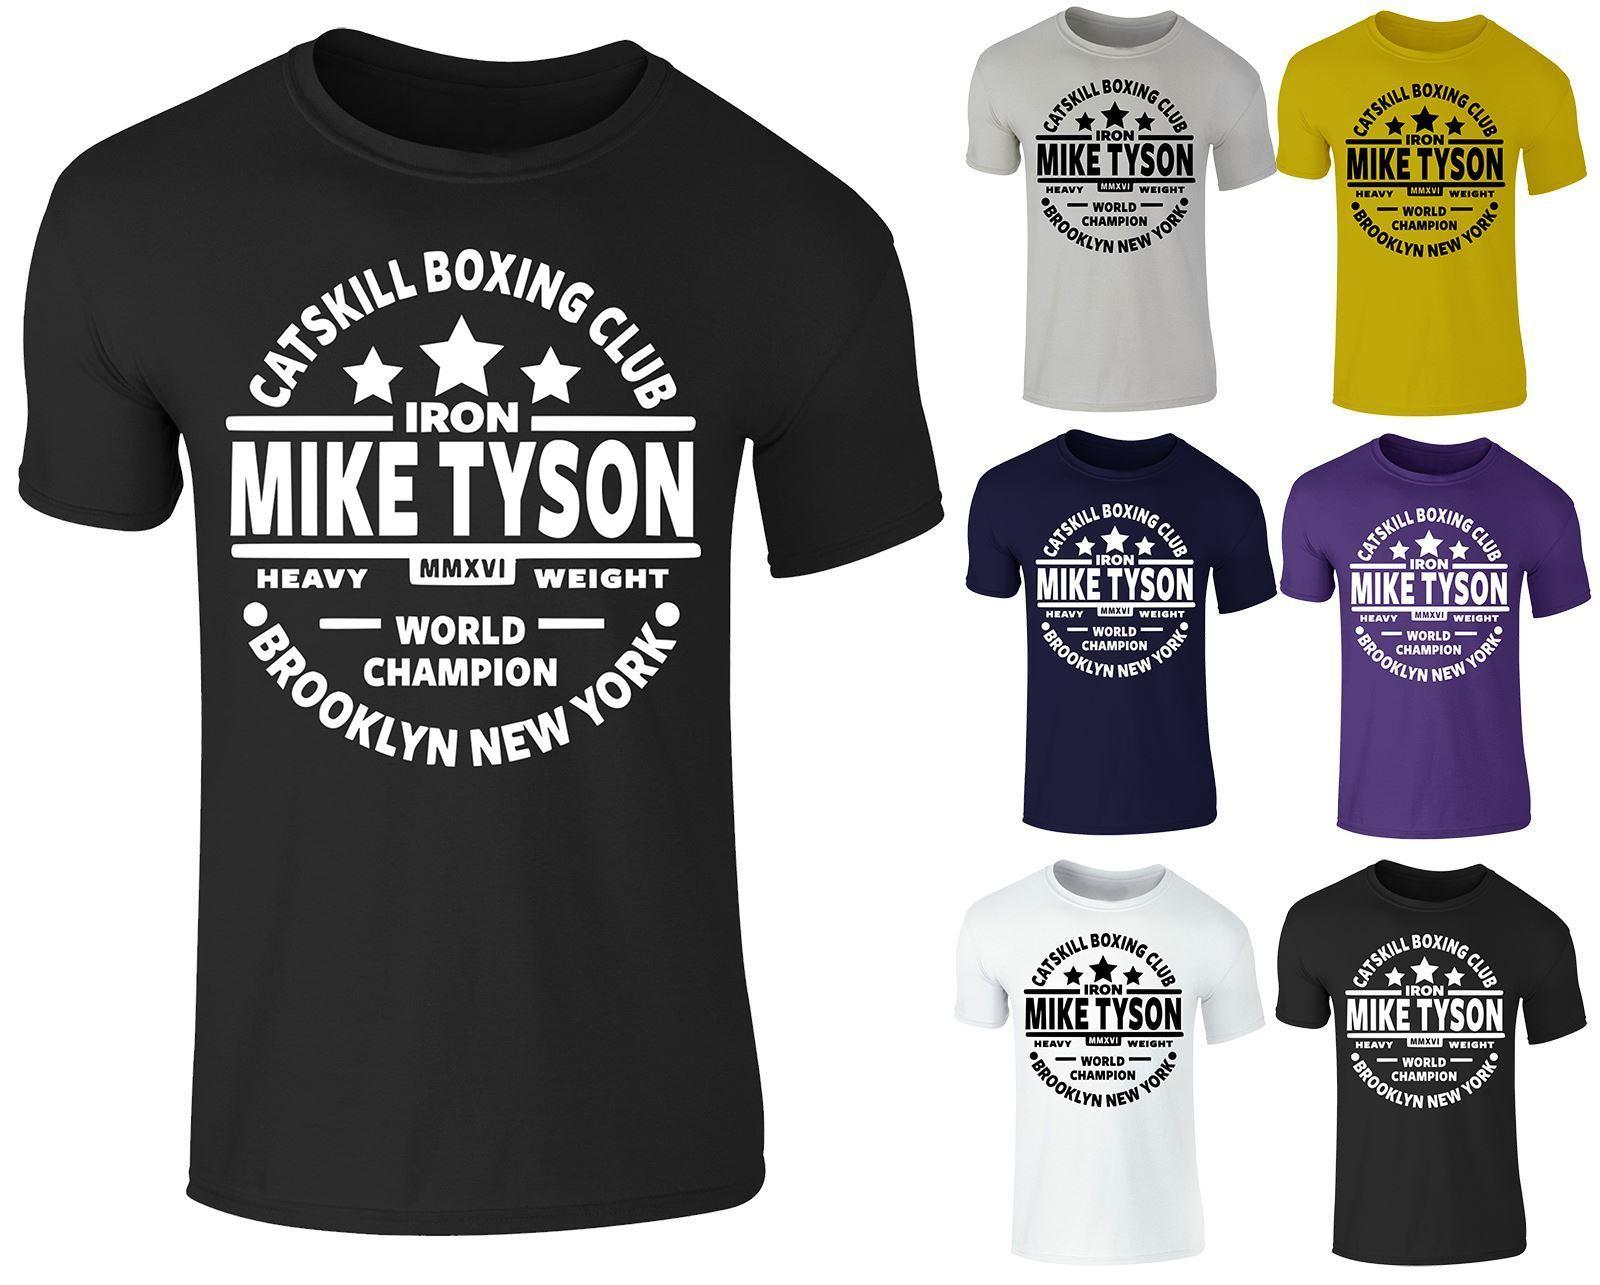 Mens Legend Mike Tyson Catskill Boxing Training Gym Cotton Crew Neck T-shirt Top